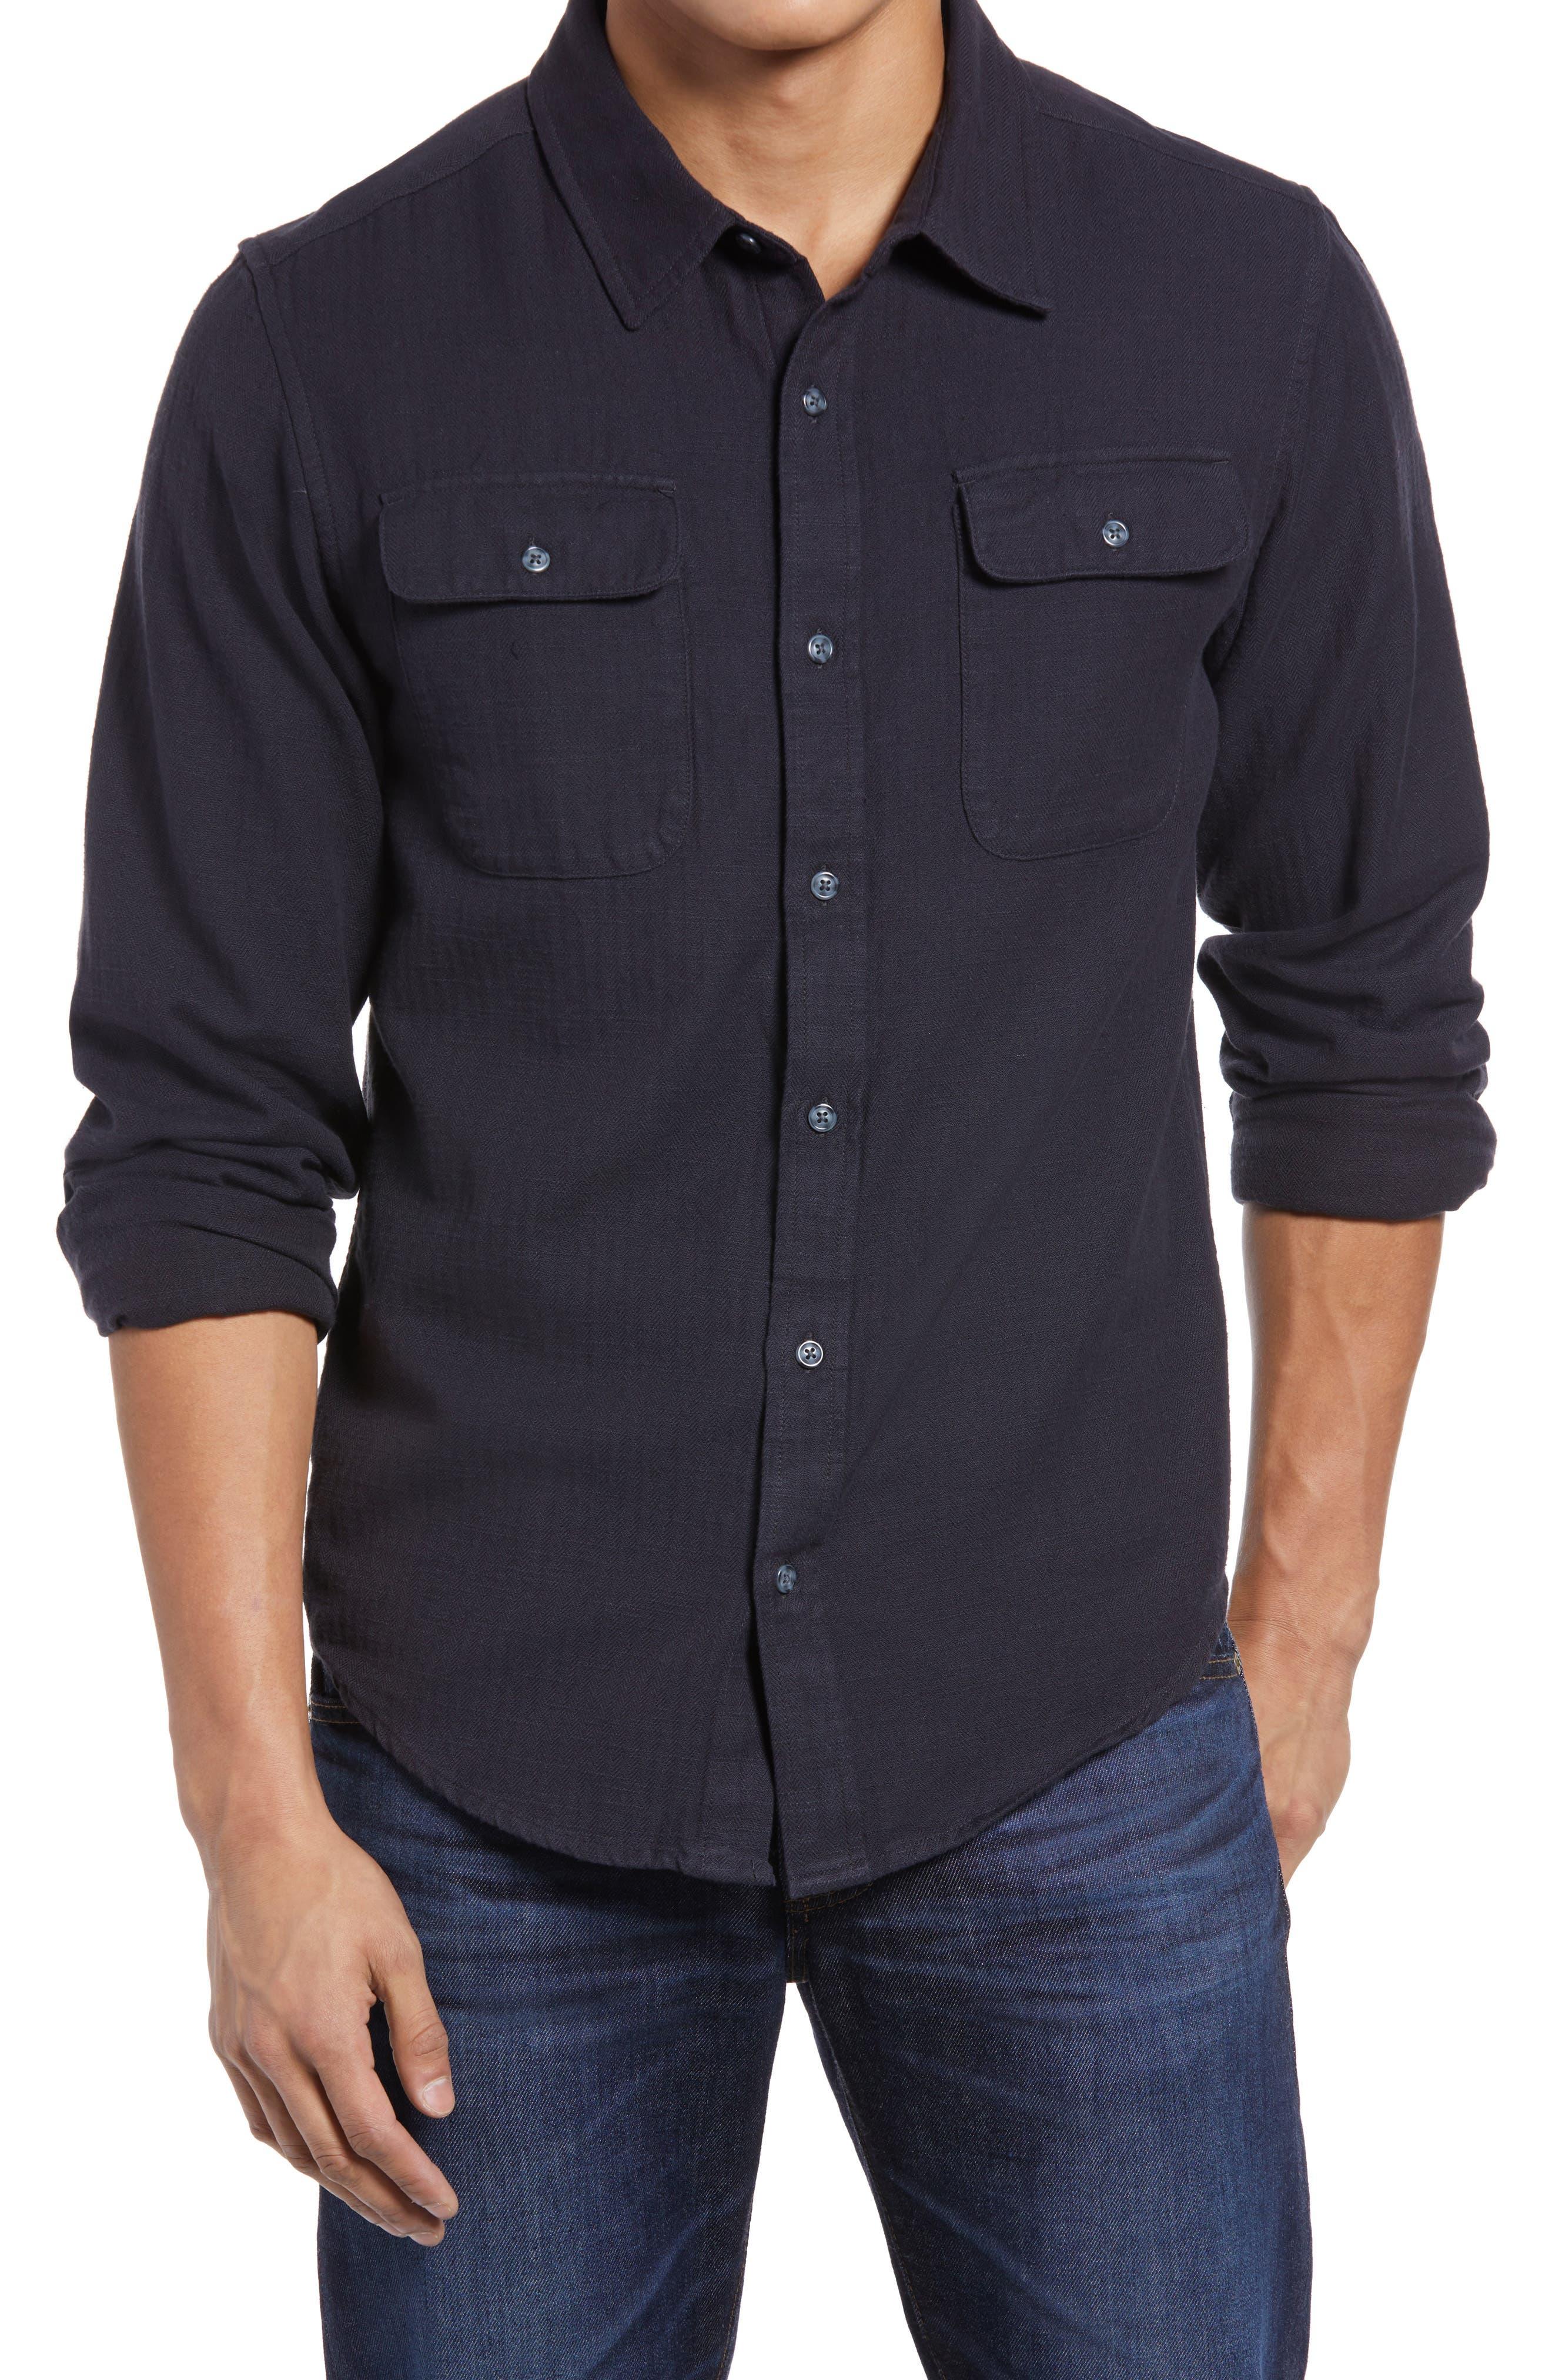 Bedford Organic Cotton Button-Up Shirt